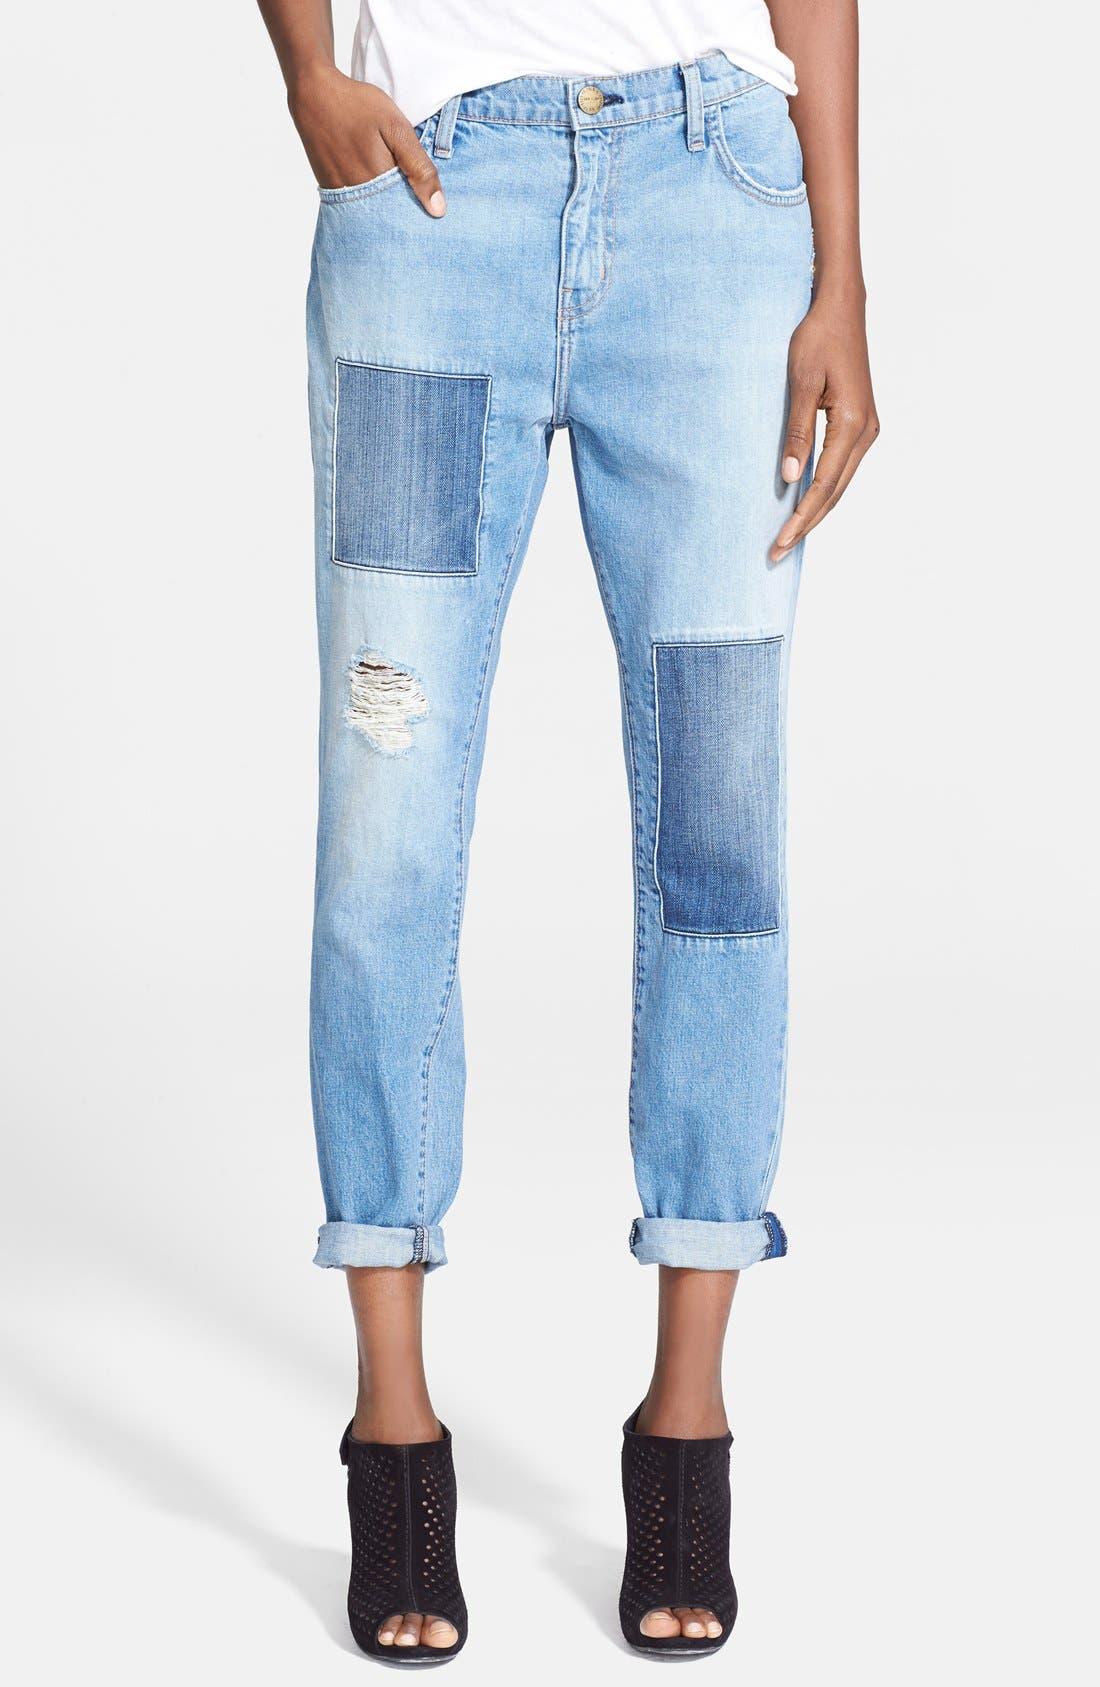 Alternate Image 1 Selected - Current/Elliott 'The Fling' Destroyed Crop Jeans (Kasey with Repair)